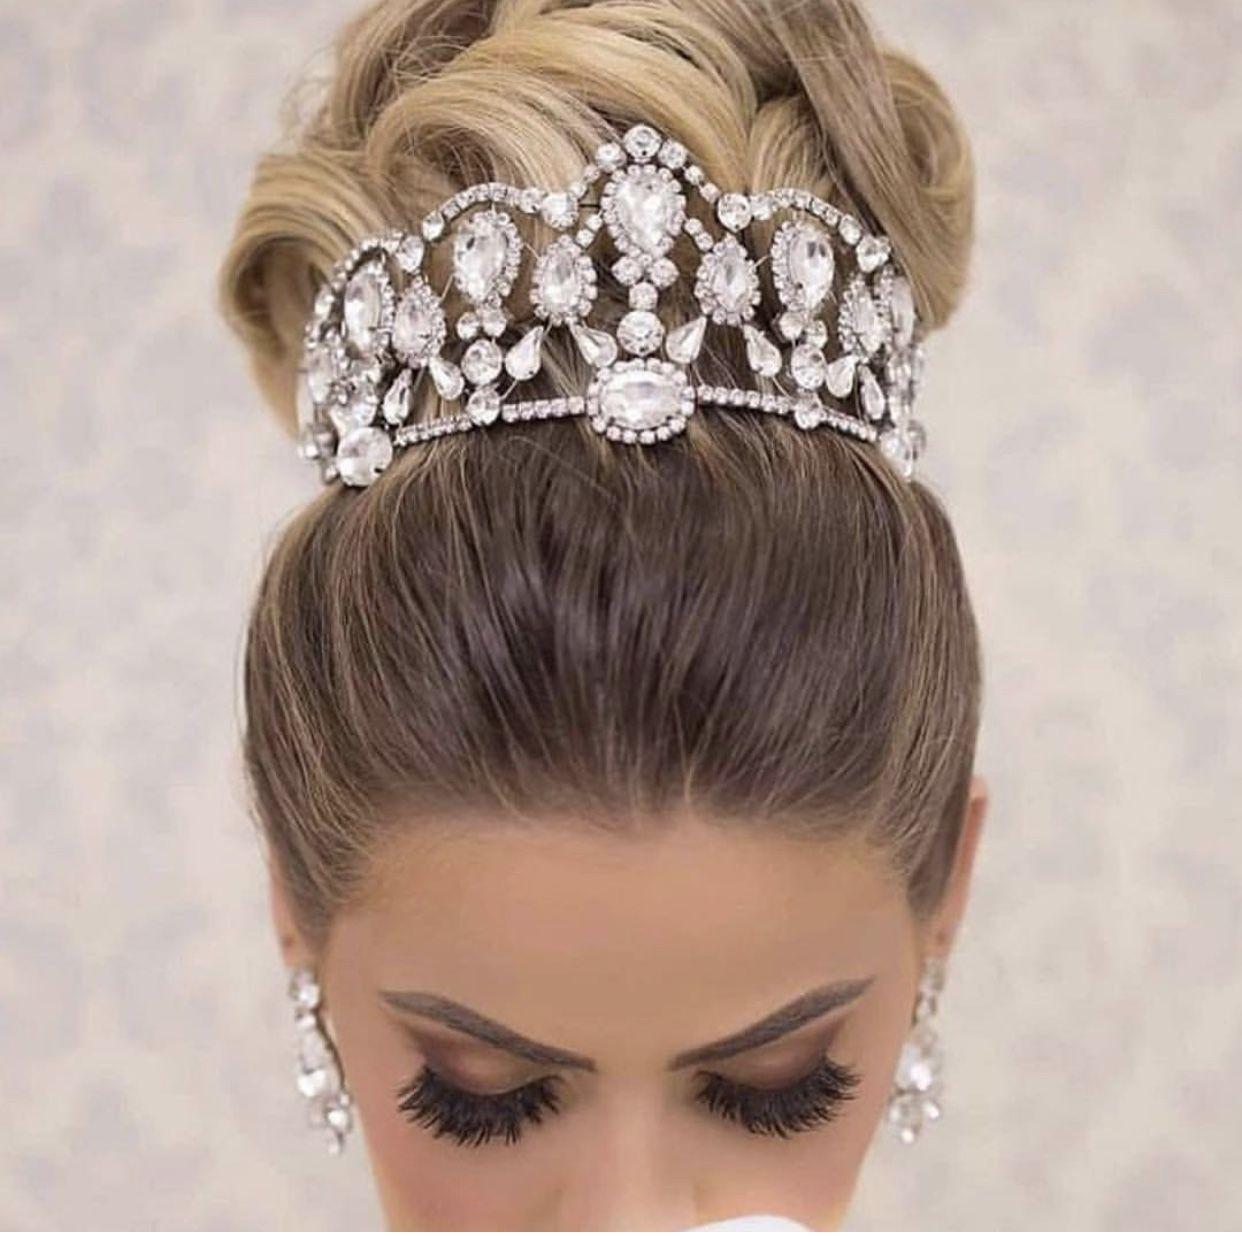 Wedding hairstyle idea! Repost luxurybridalblogger